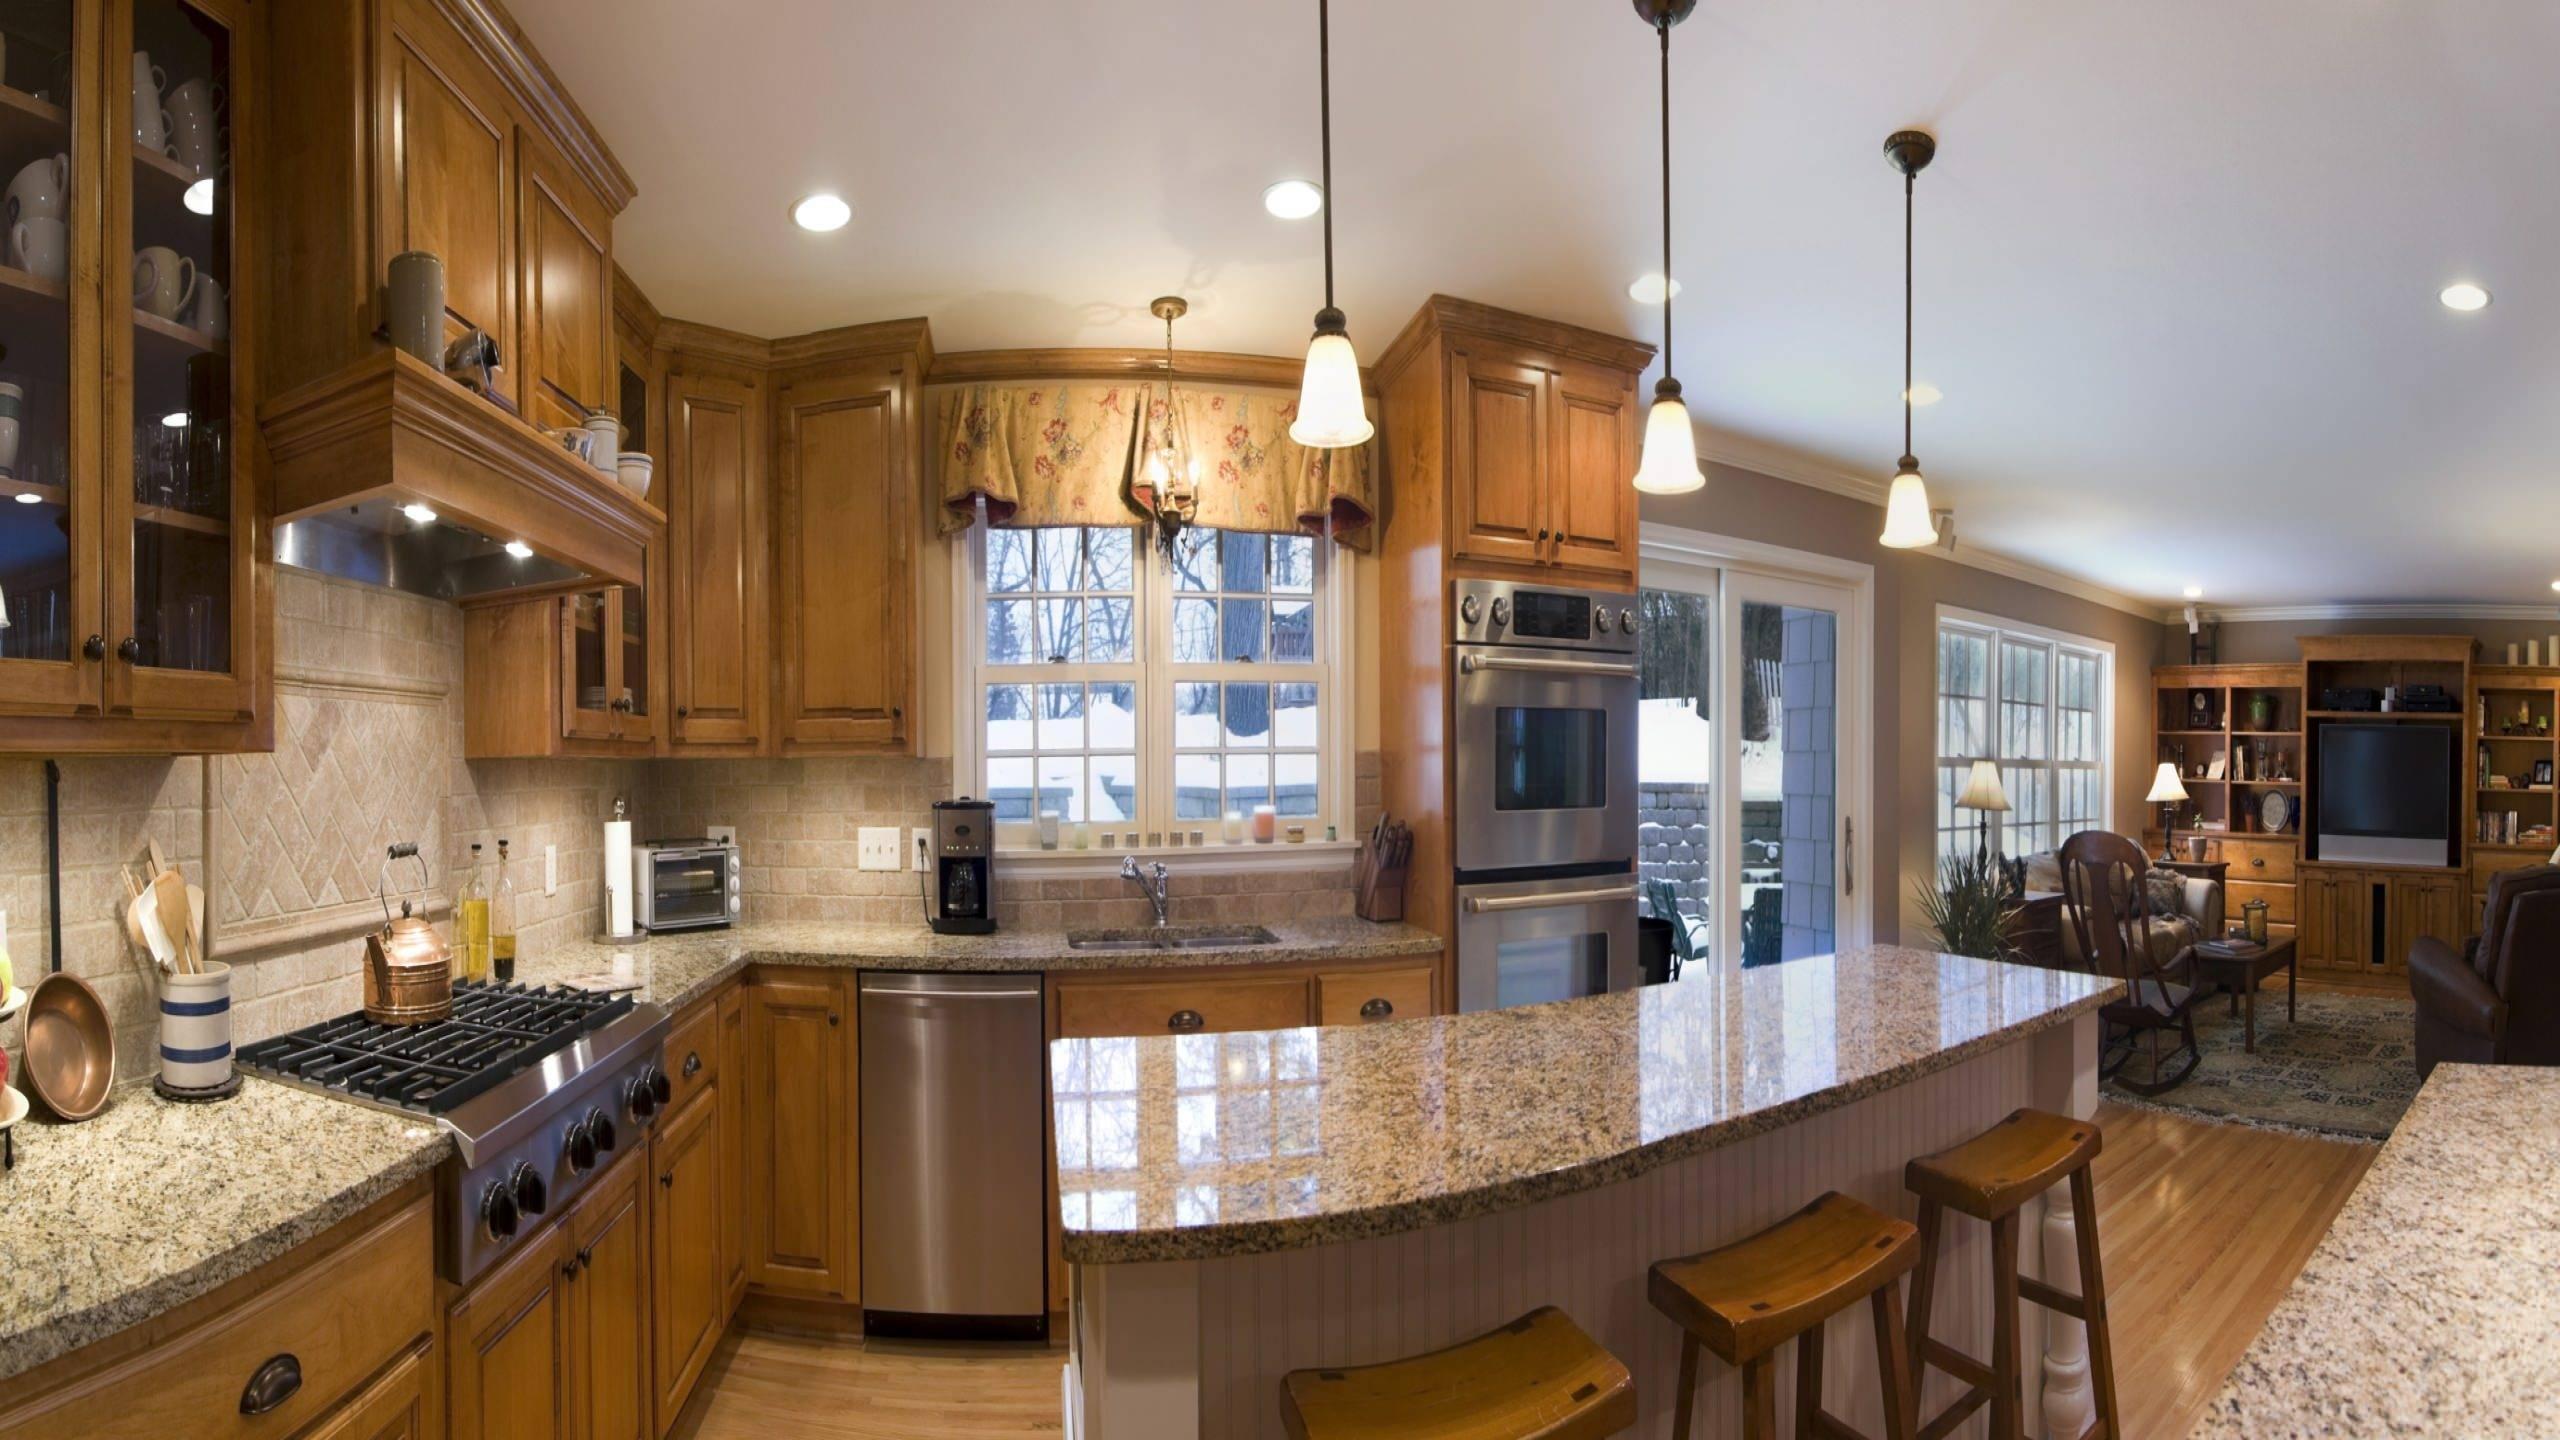 Rustic Pendant Lighting Kitchen – Kitchen Design Inside Rustic Pendant Lighting For Kitchen (View 6 of 15)